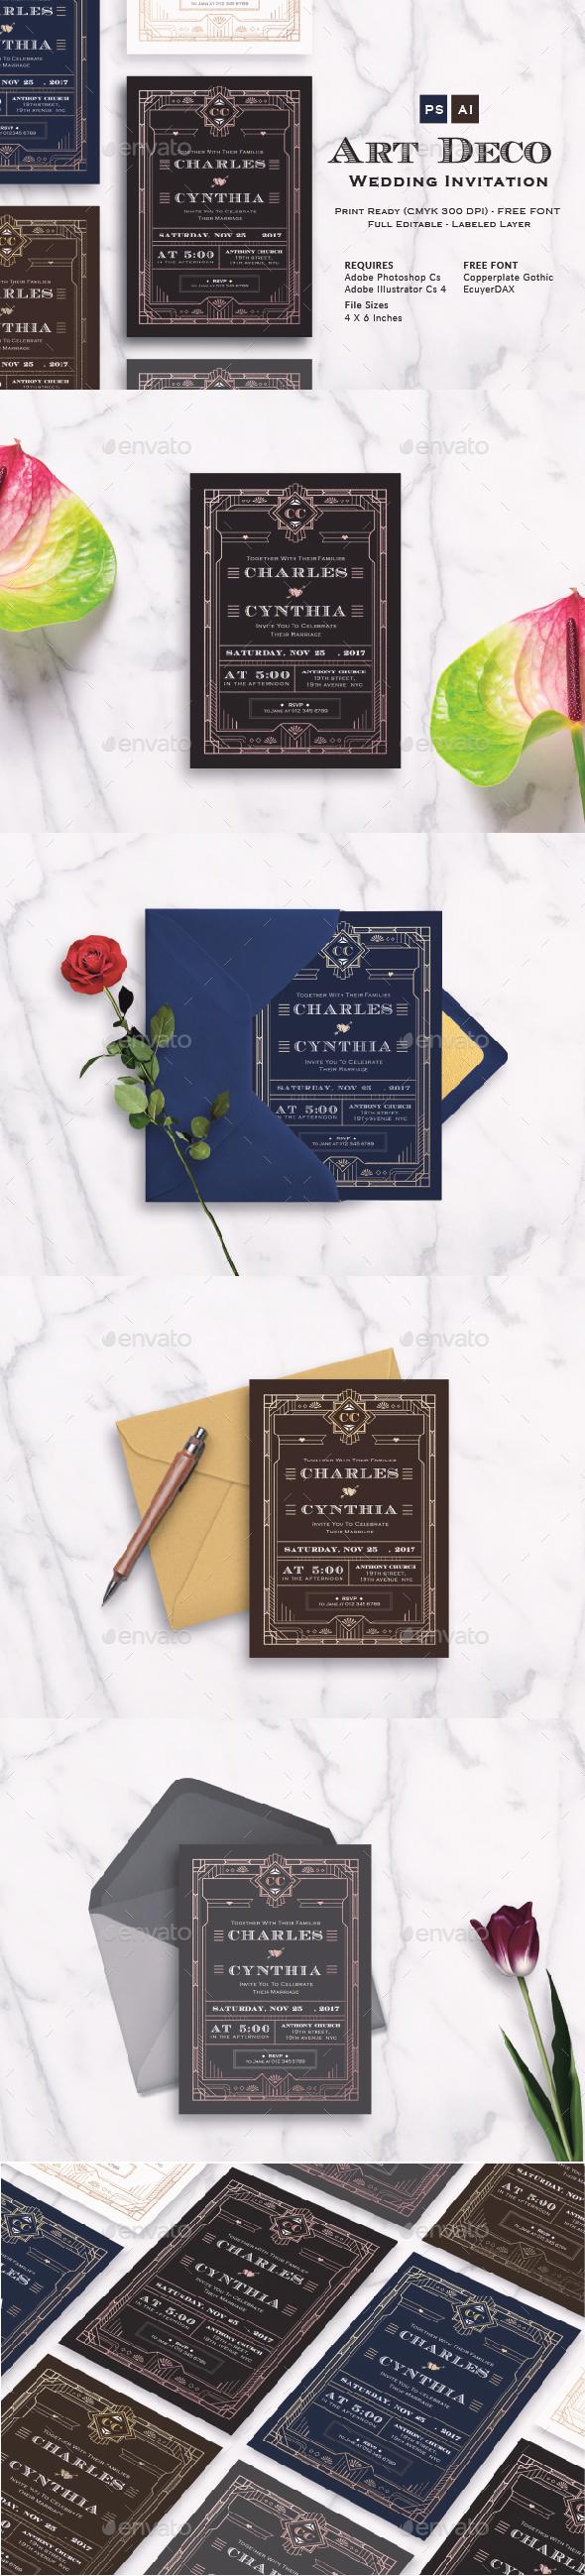 Art Deco Wedding Invitation Vol. 4 - Cards & Invites Print Templates